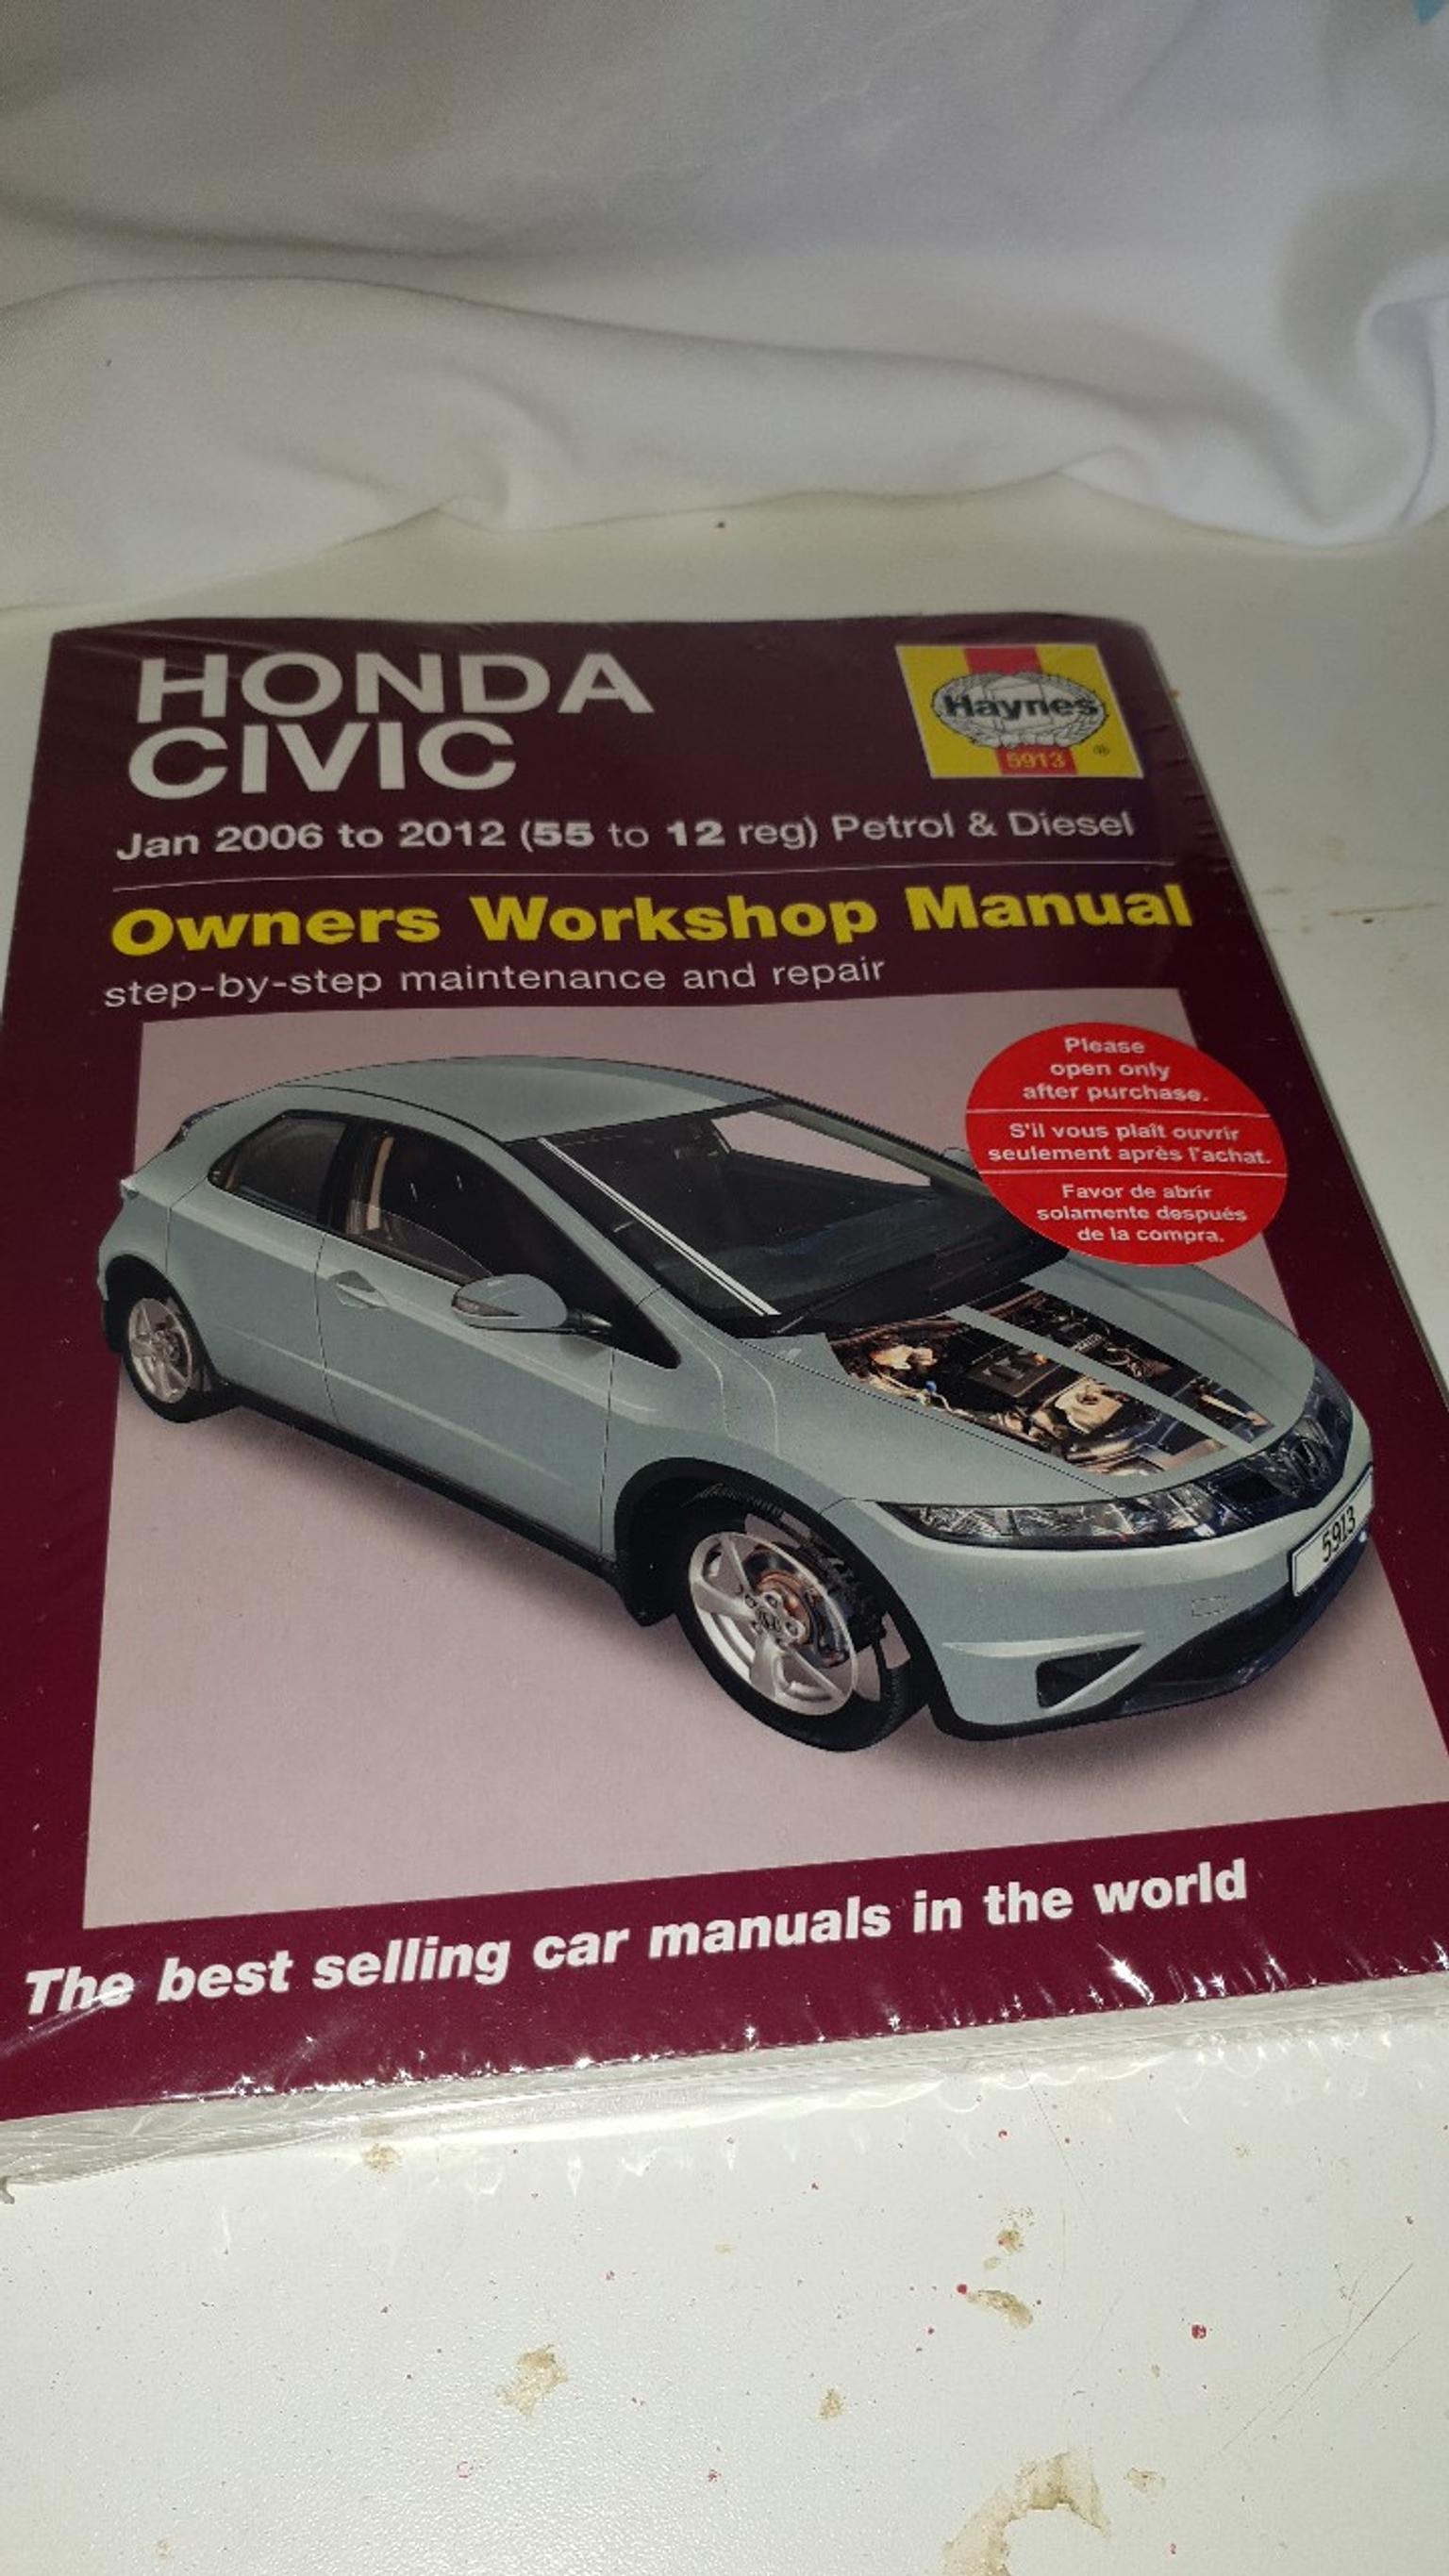 hight resolution of description honda civic owners workshop manual